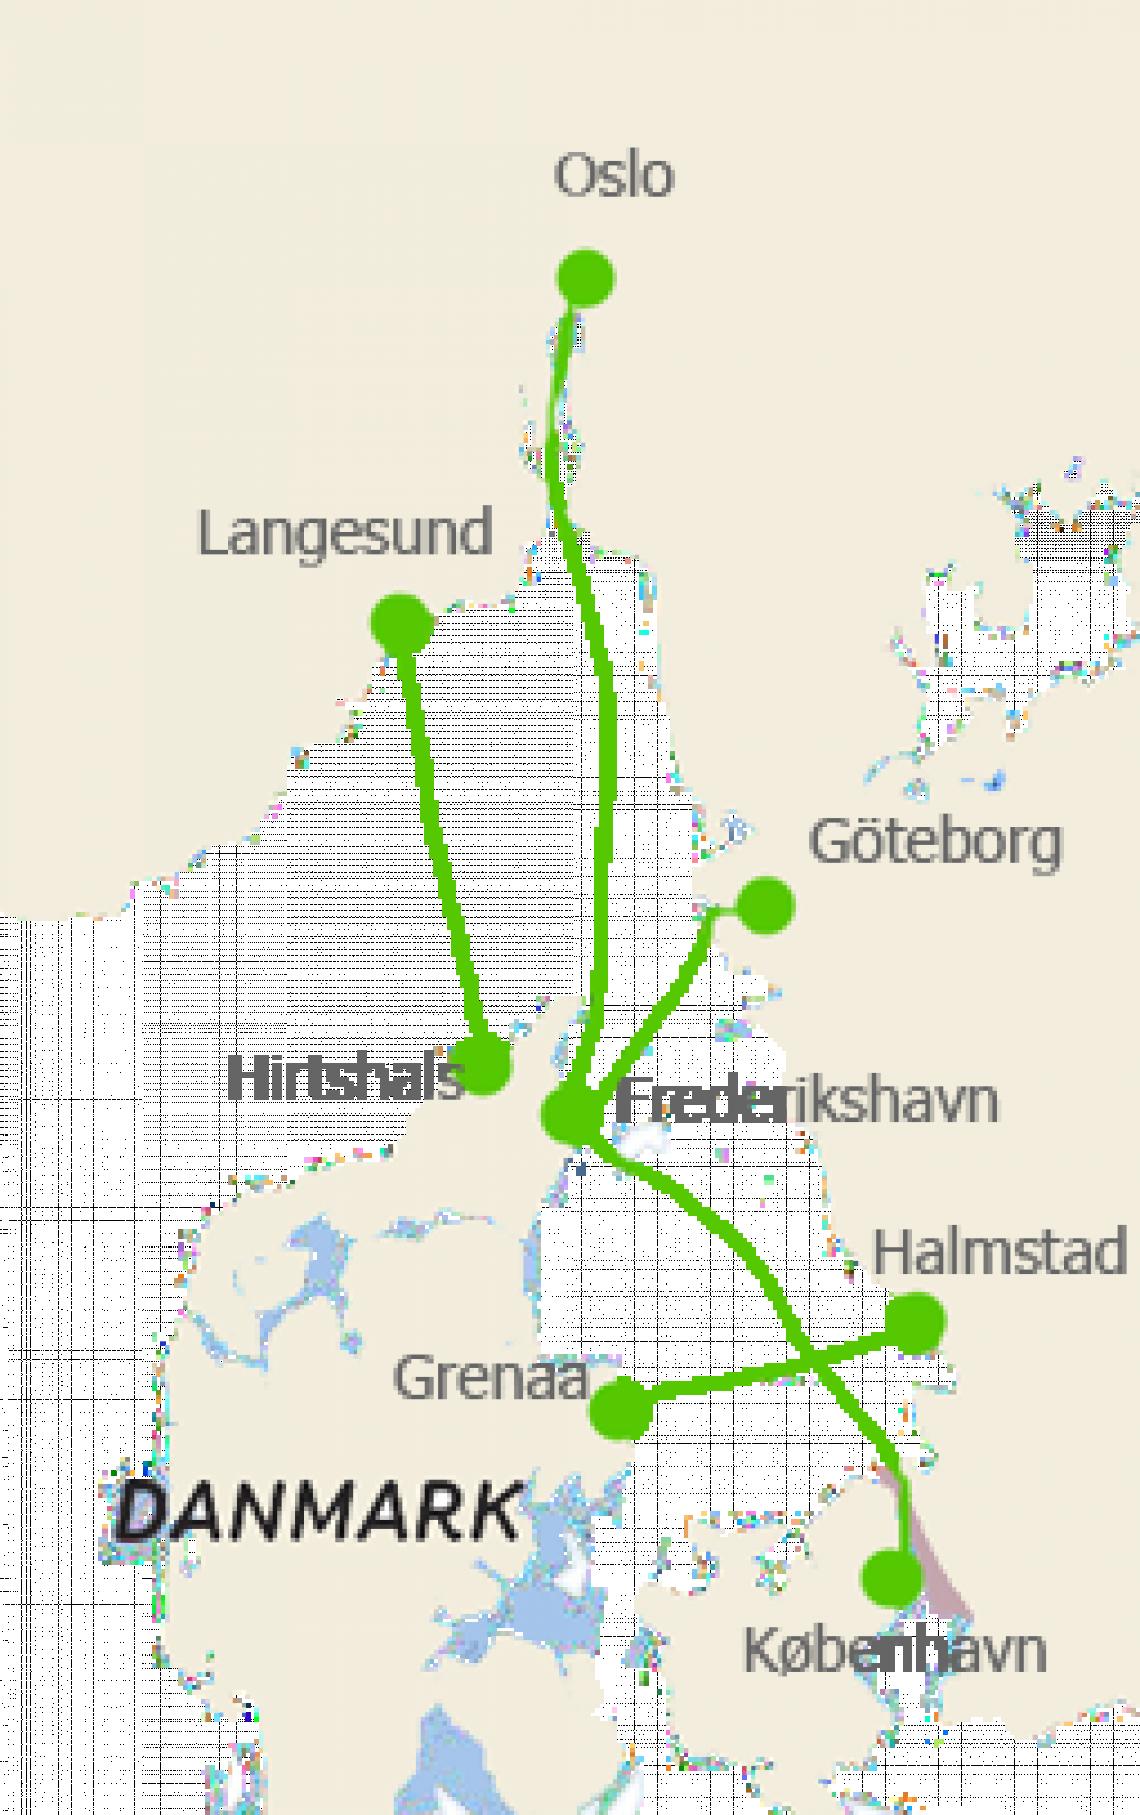 færge, skiferie, dfds seaways, fjordline, stenaline